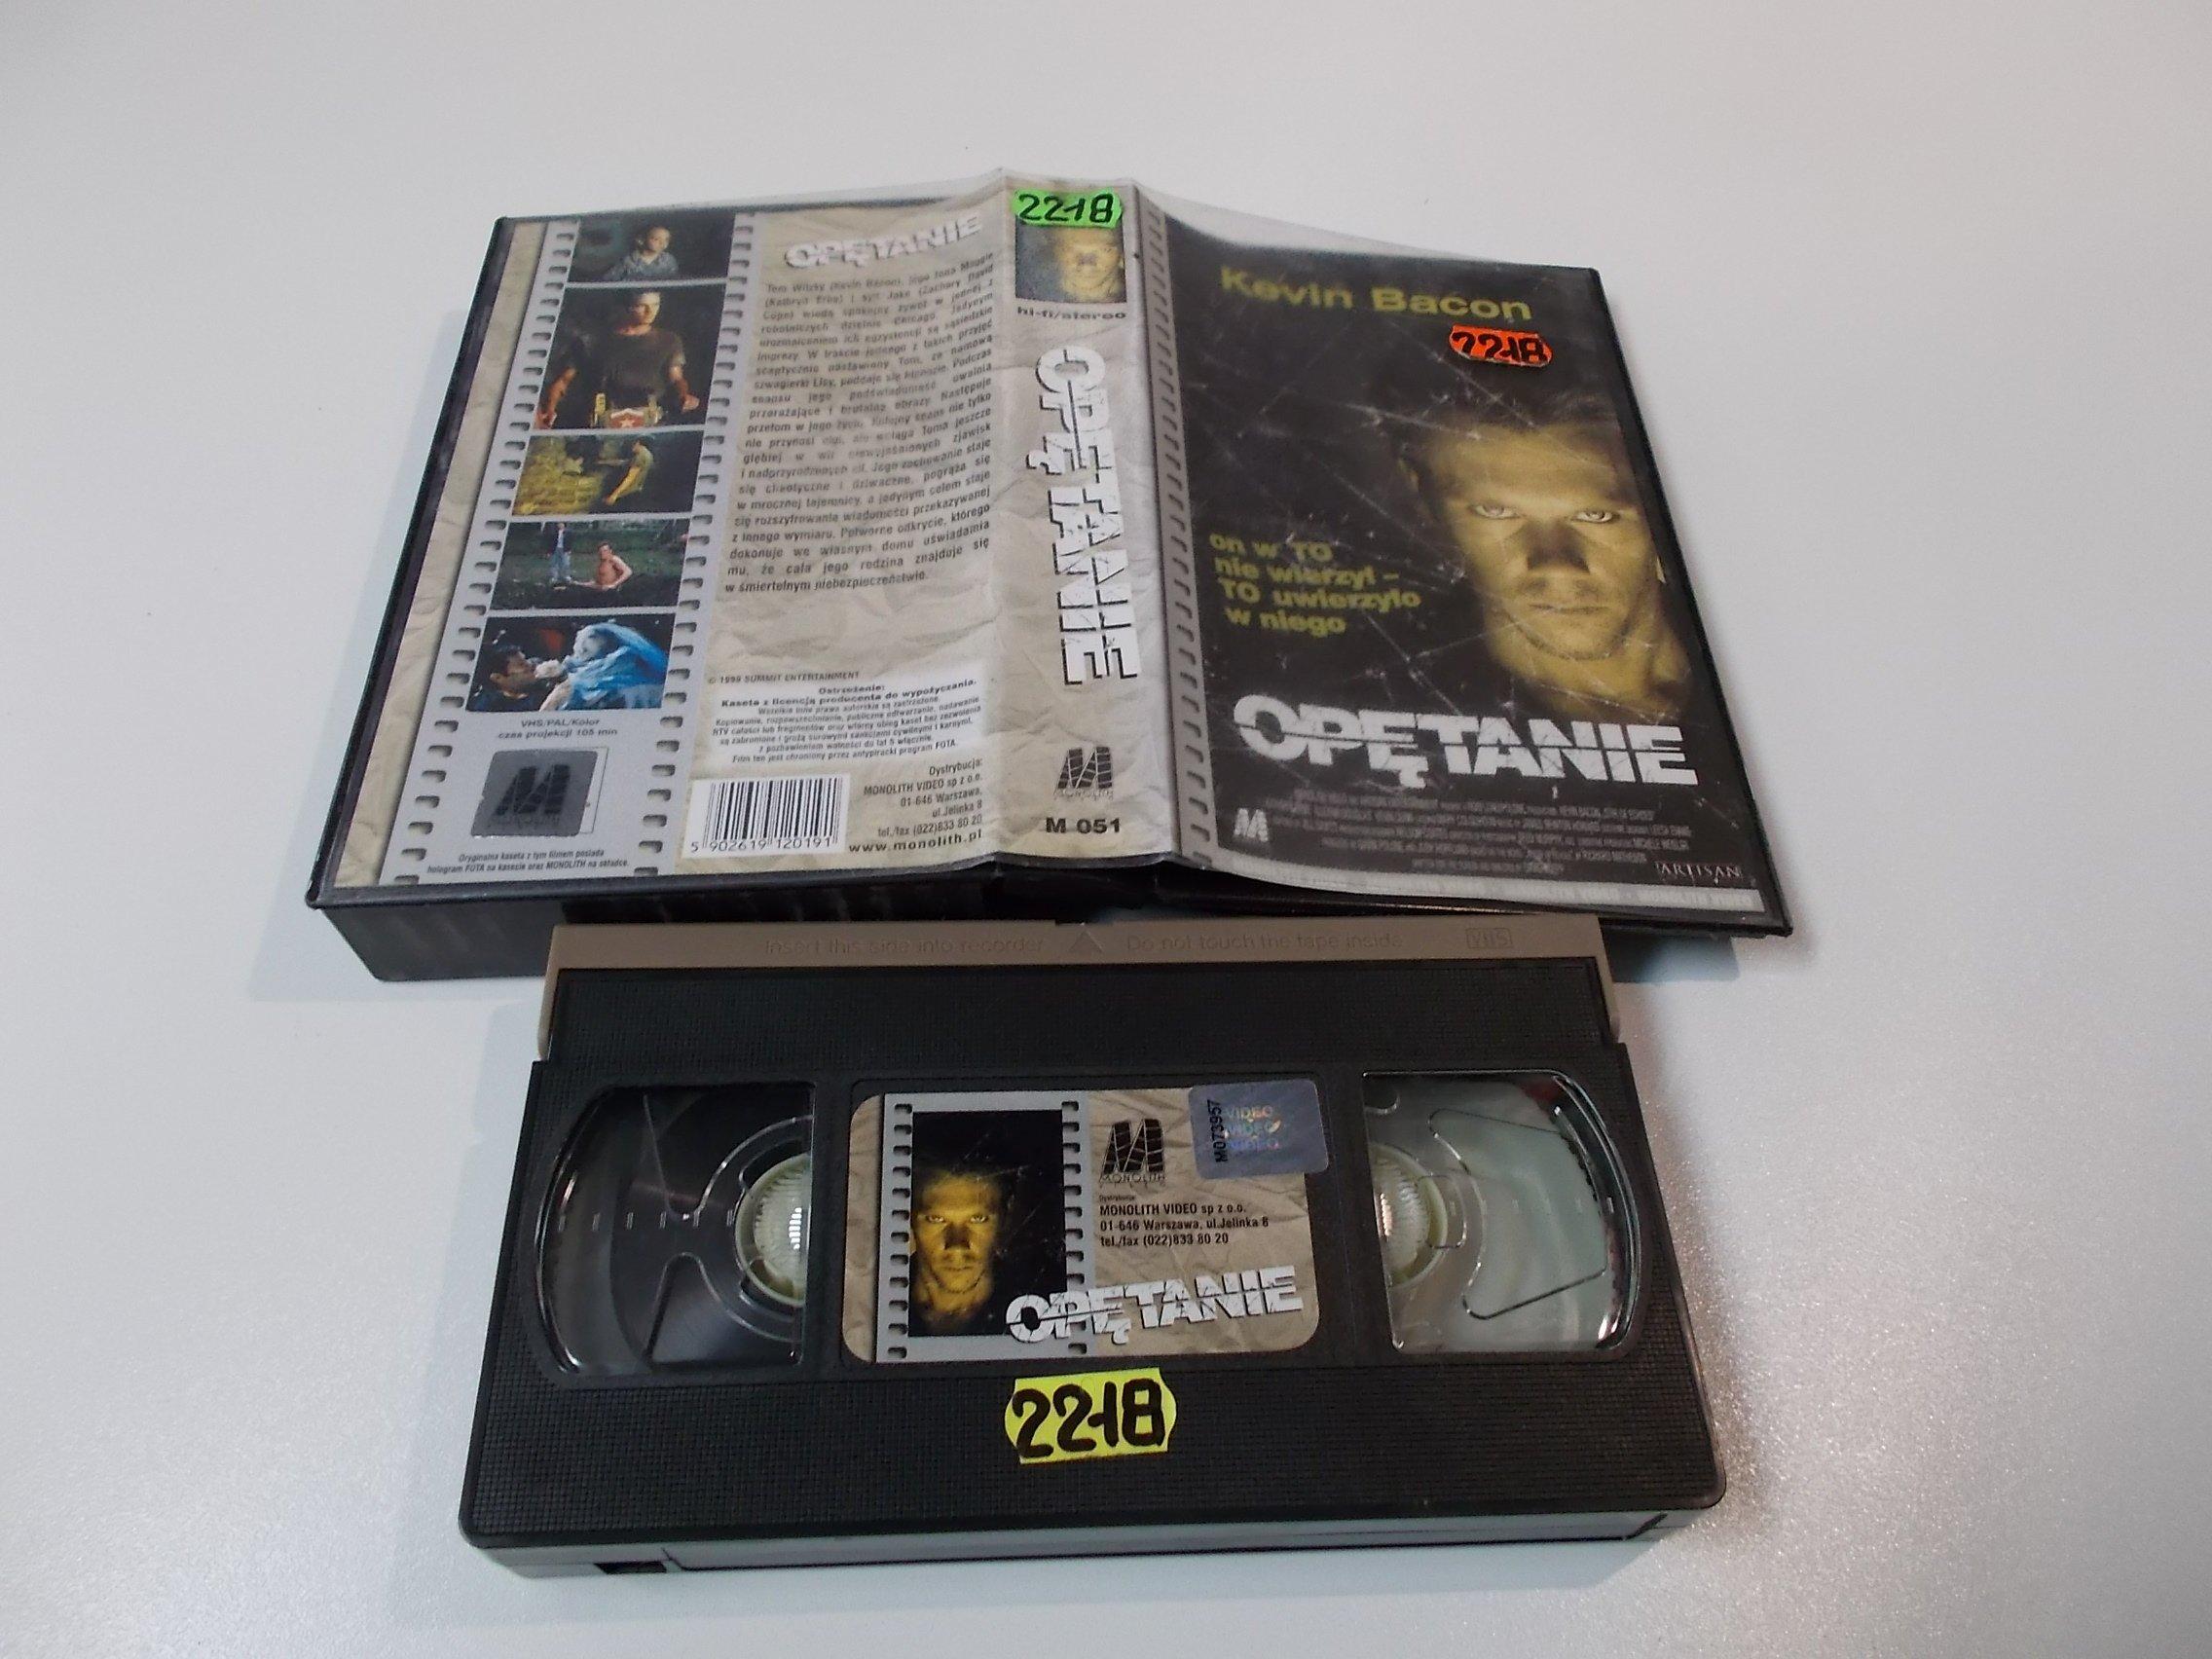 OPĘTANIE - Kaseta Video VHS - Opole 1586